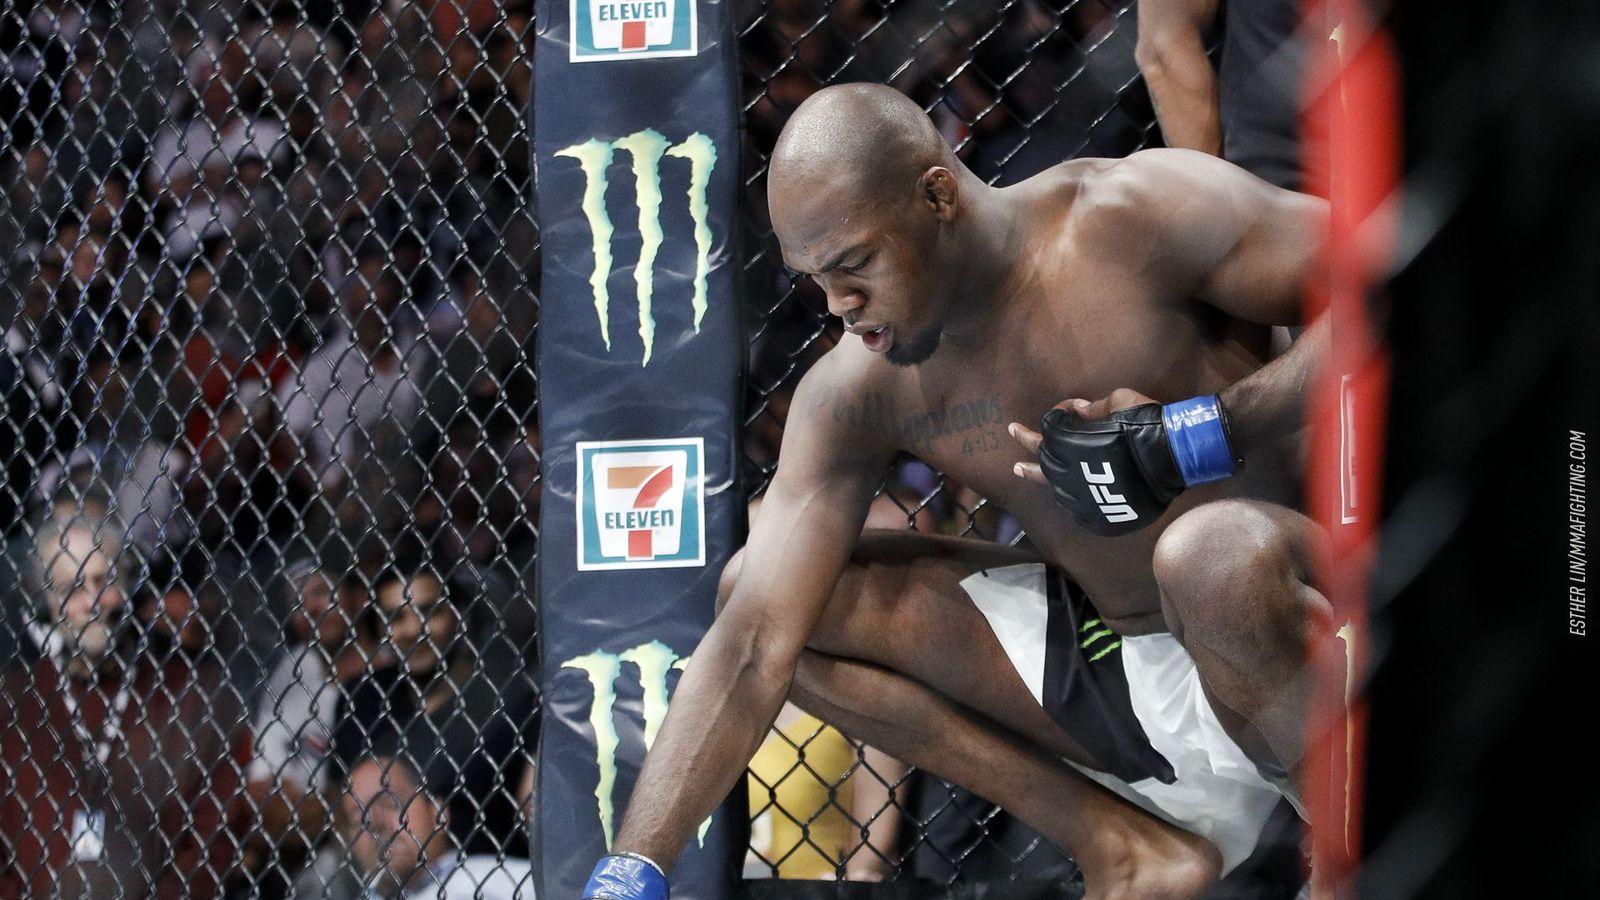 Jon Jones failed drug test at UFC 214